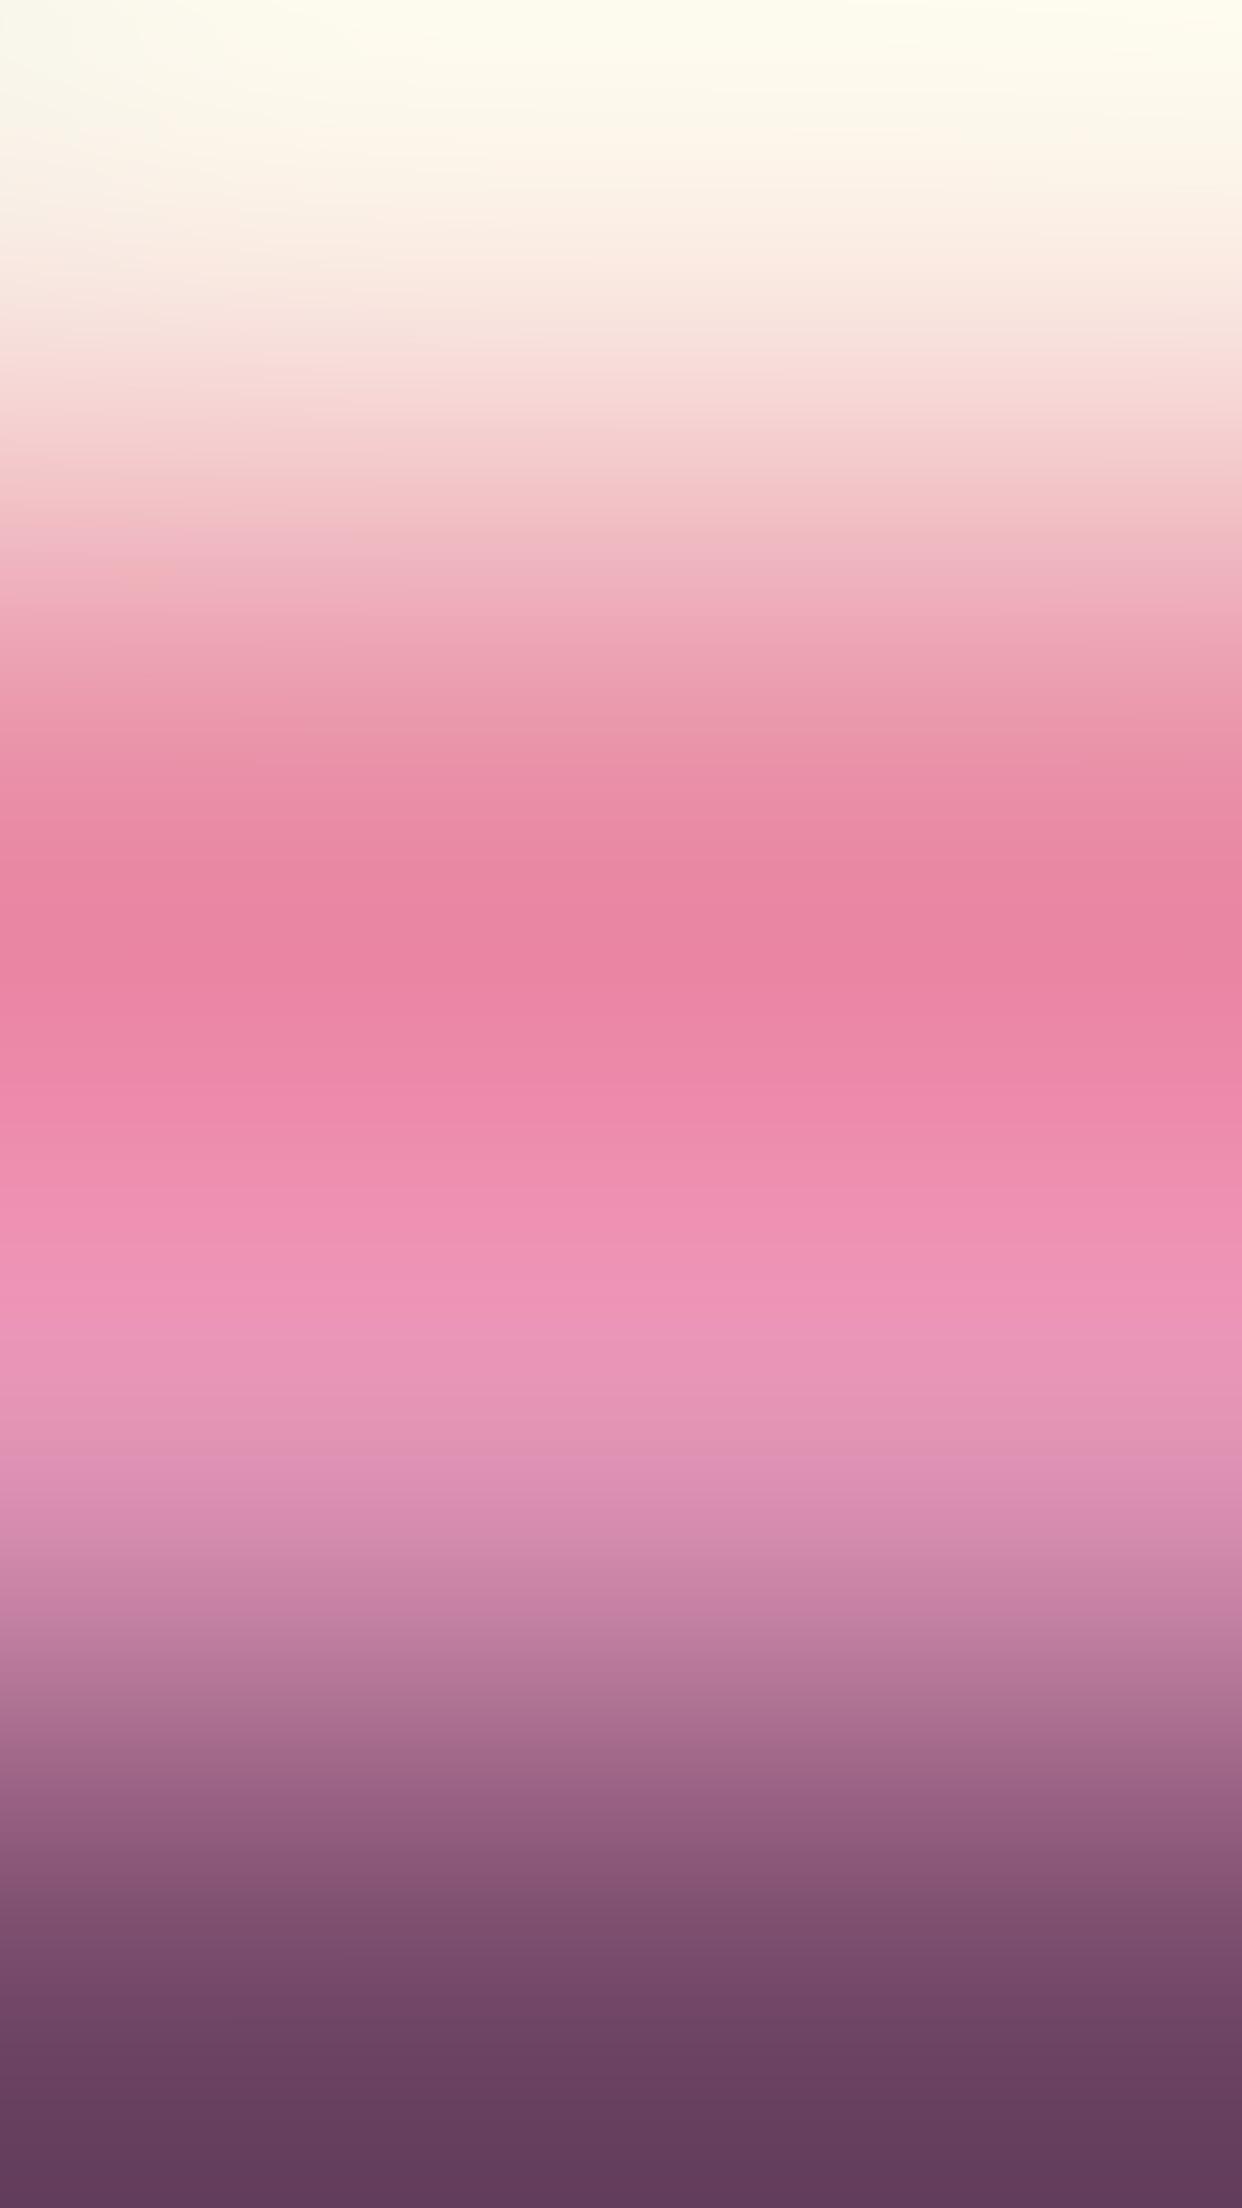 Wallpaper hd for iphone 6 plus purple